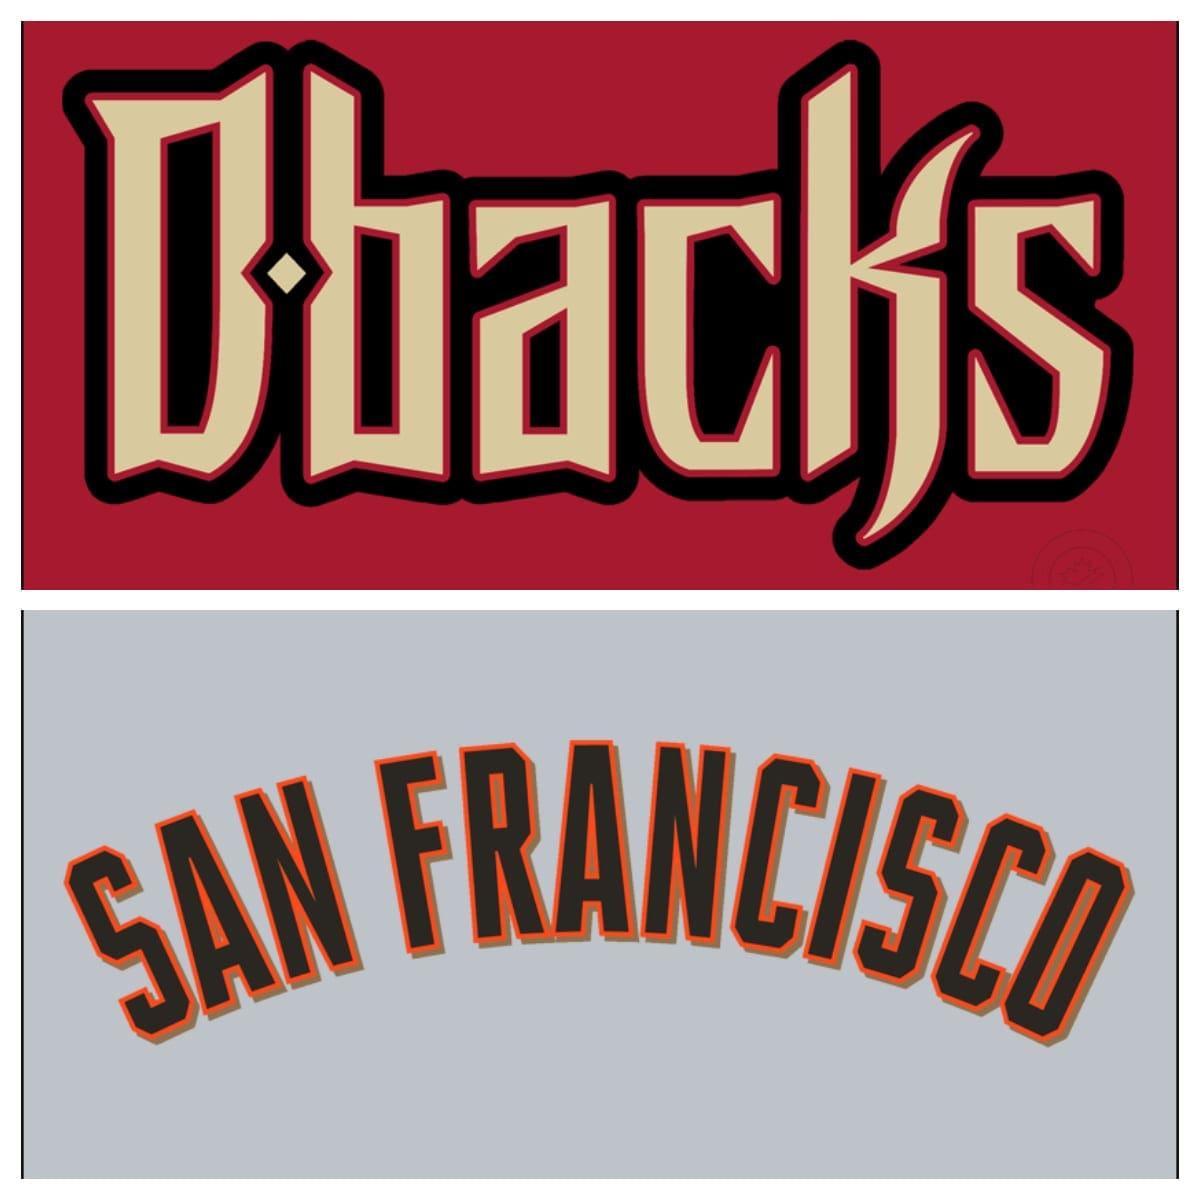 Arizona Diamondbacks vs San Francisco Giants Stats